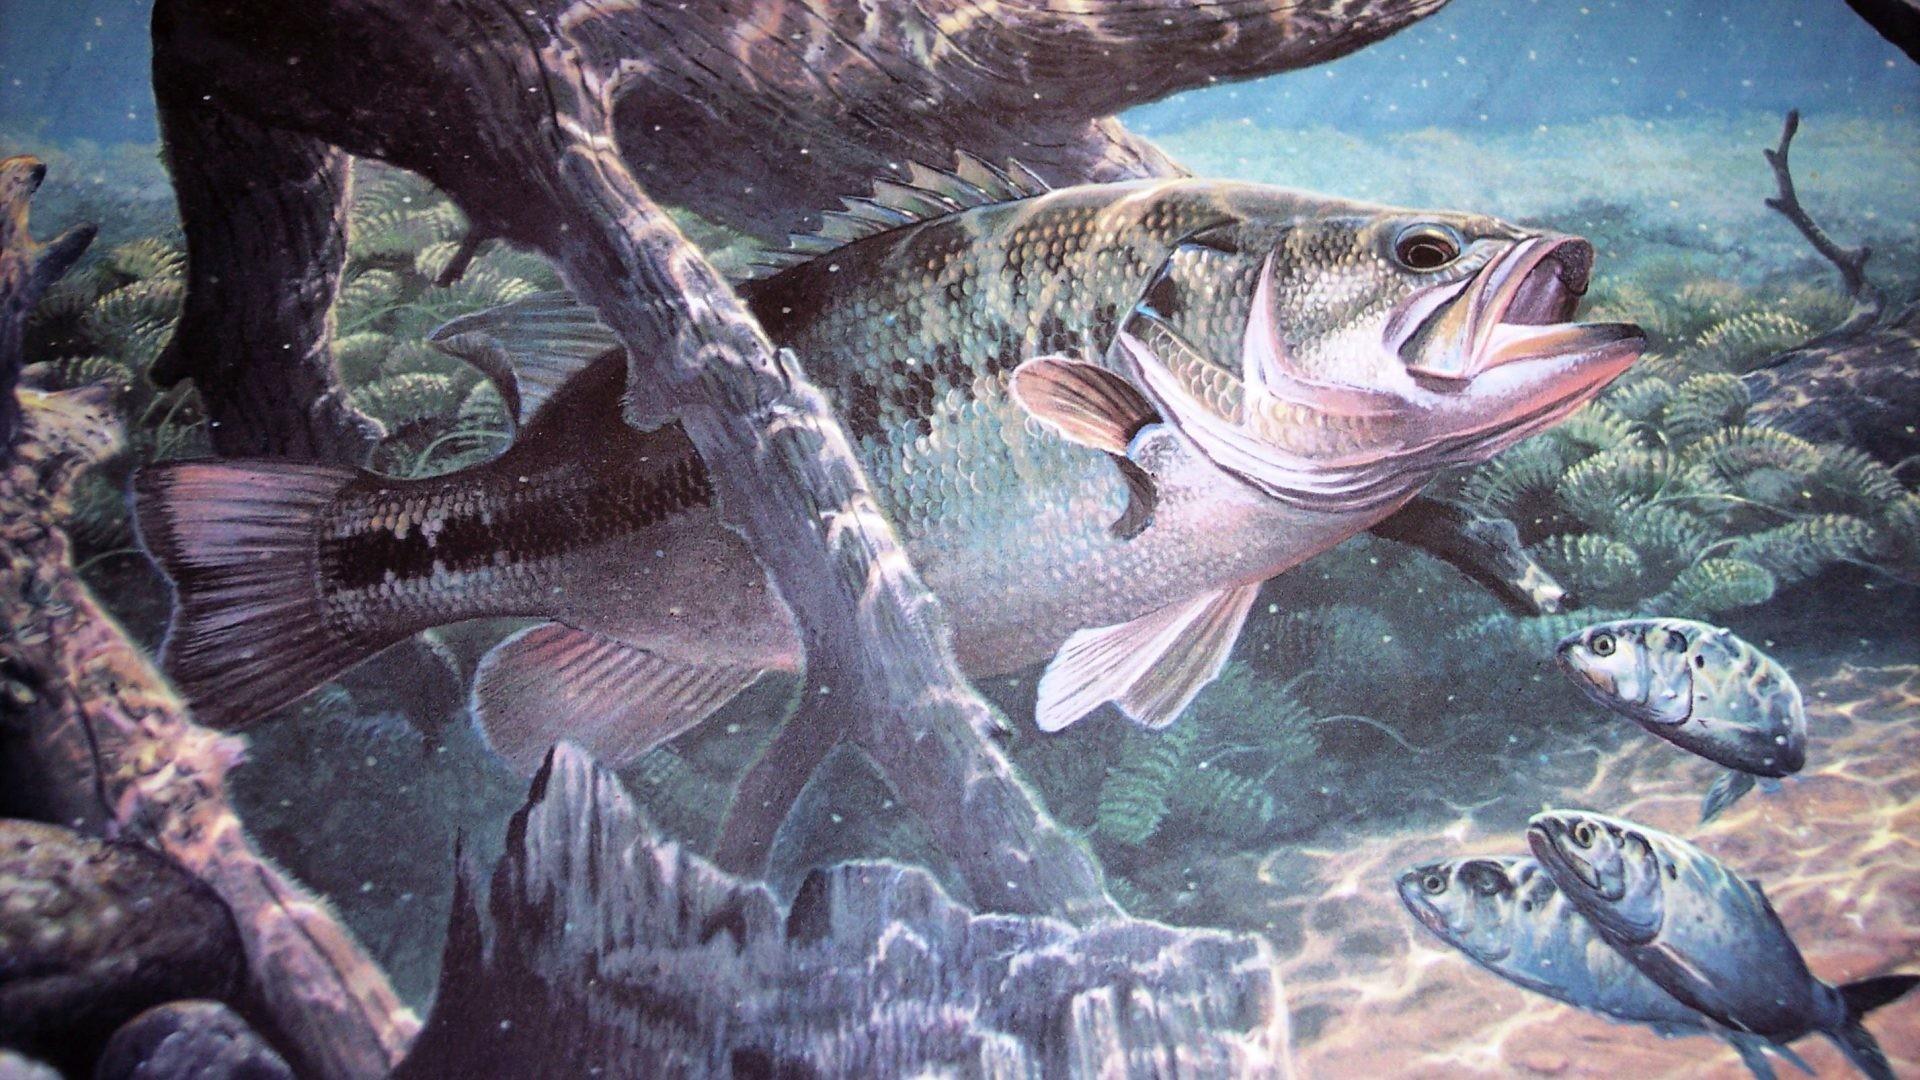 Underwater Tag – Fishes Bass Underwater Lake Water Artwork Sport Fishing  Fish River Stock Photo Free